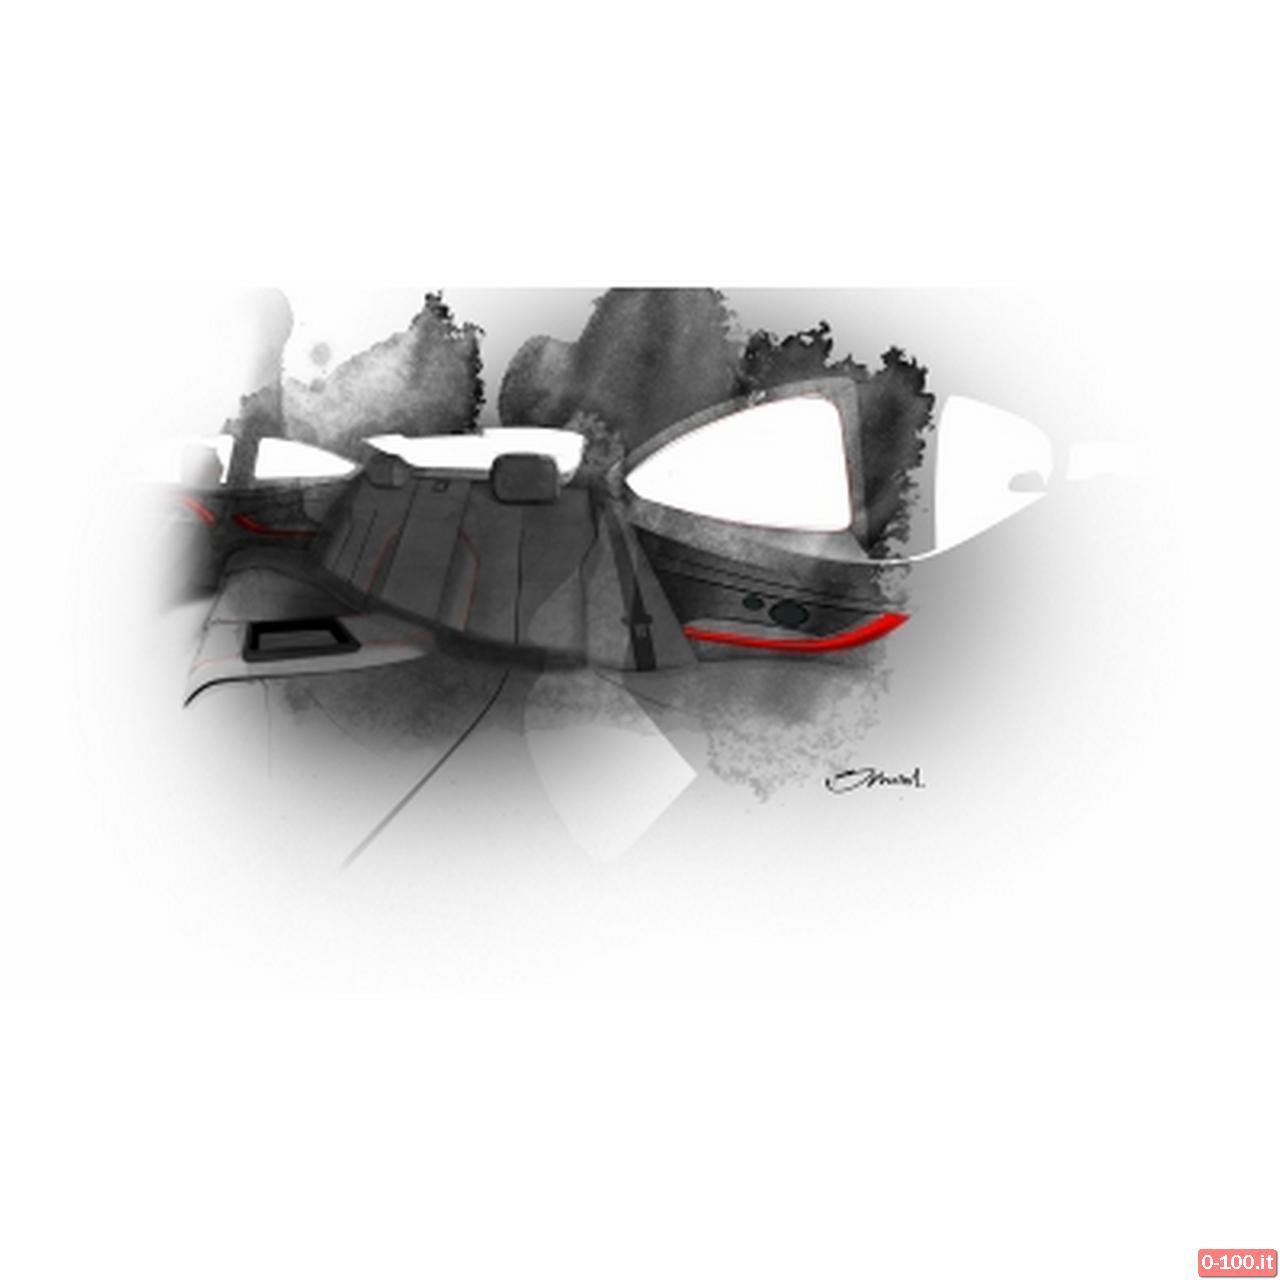 bmw_serie-4-coupé_0-100_142